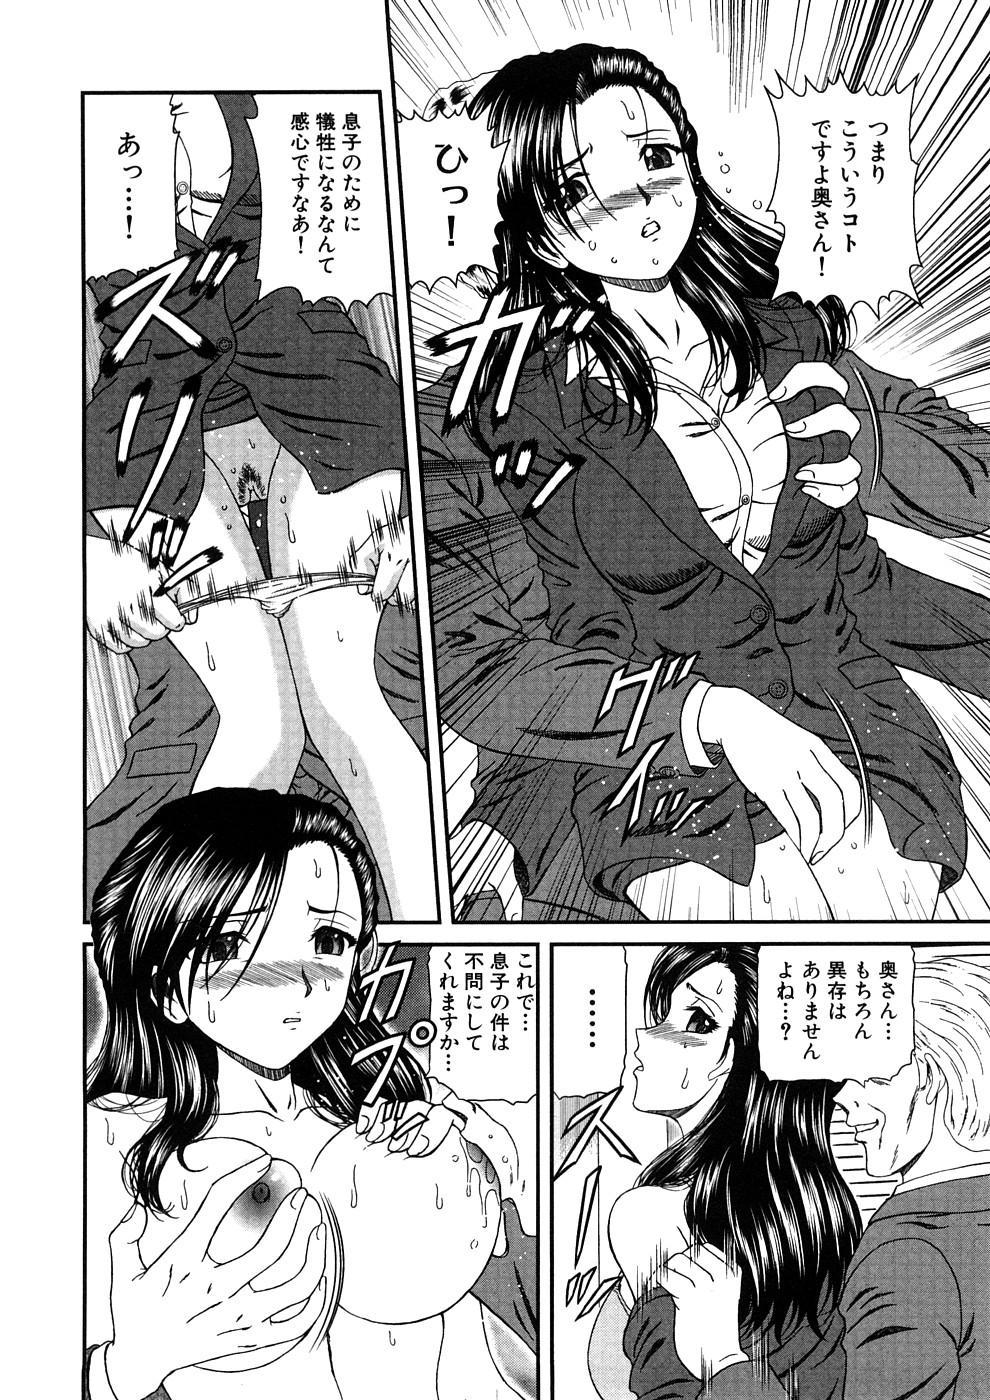 Geki Yaba Anthology Vol. 1 - Naka ni Dashite yo 144